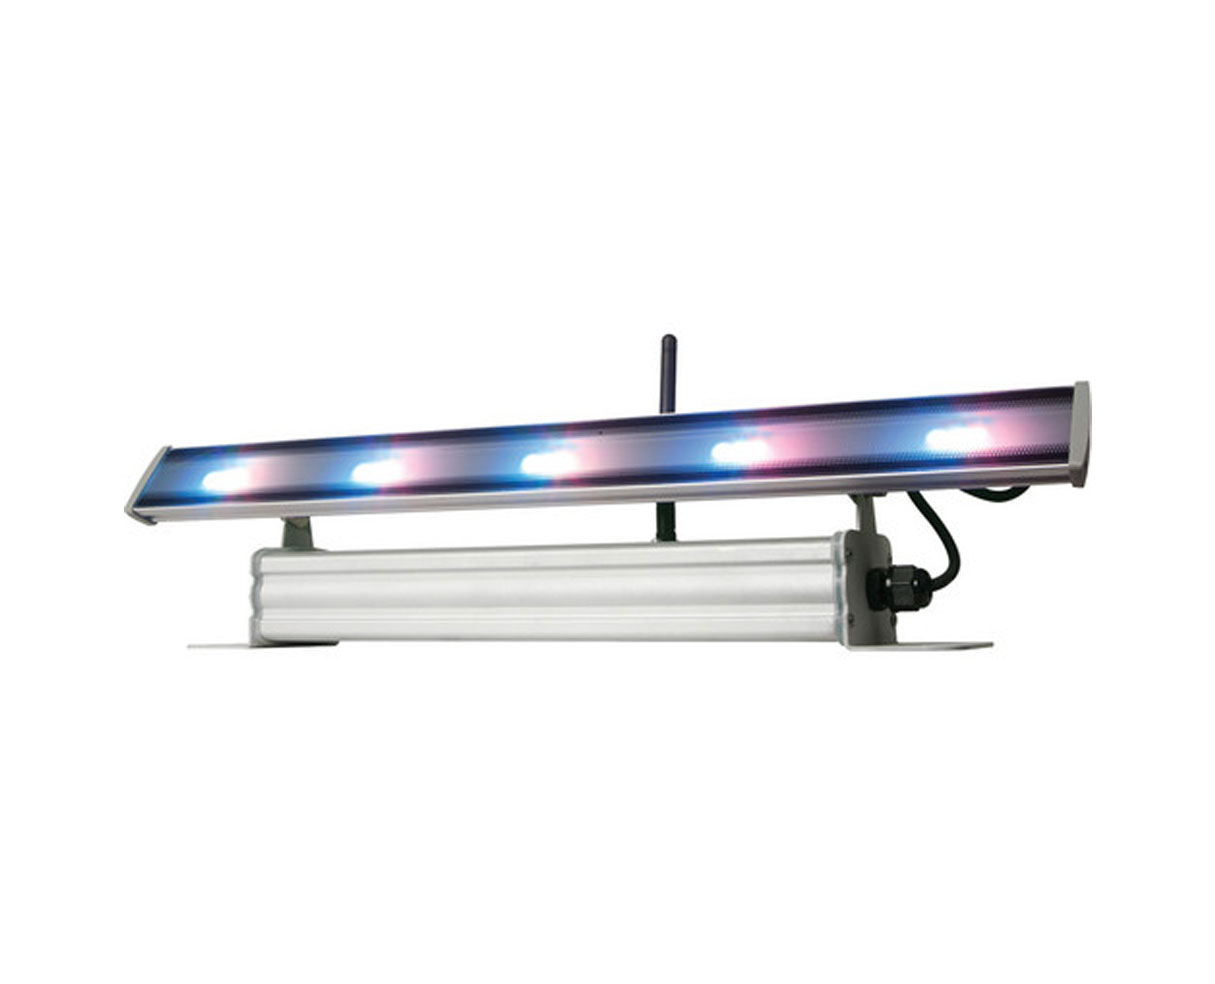 american dj wifly wash bar battery powered led linear light proaudiostar ebay. Black Bedroom Furniture Sets. Home Design Ideas